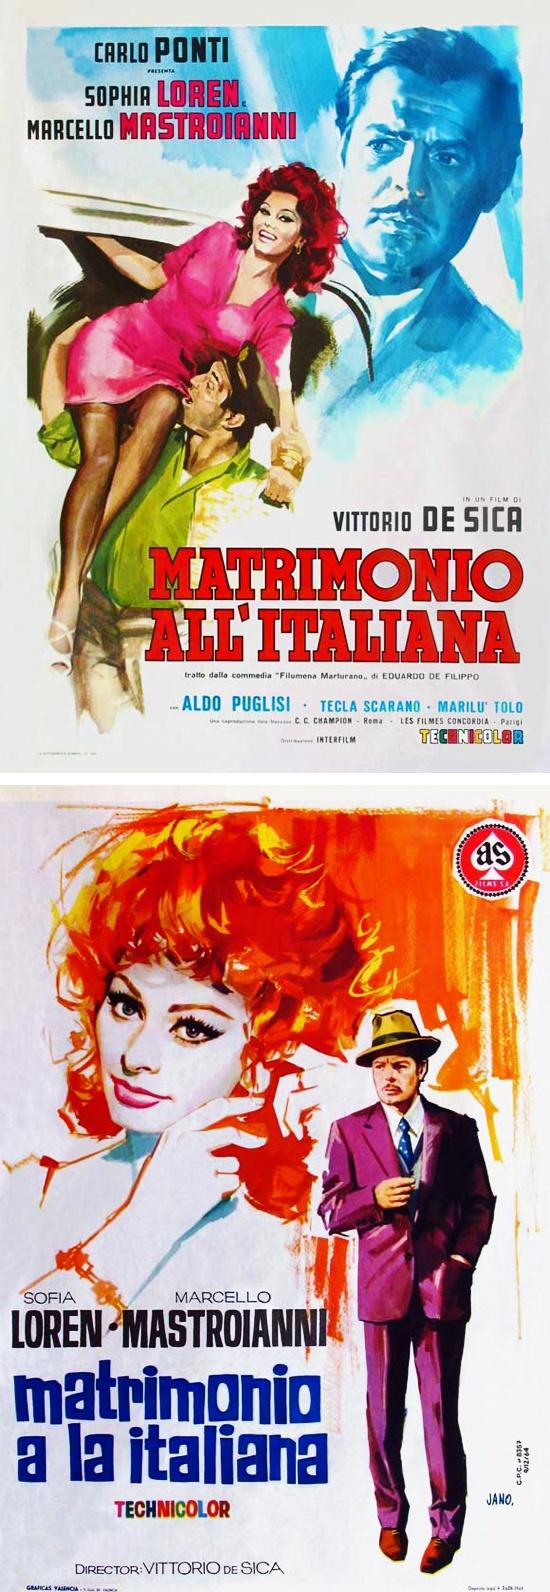 Sophia Loren                                                                                                                                                                                 Mais